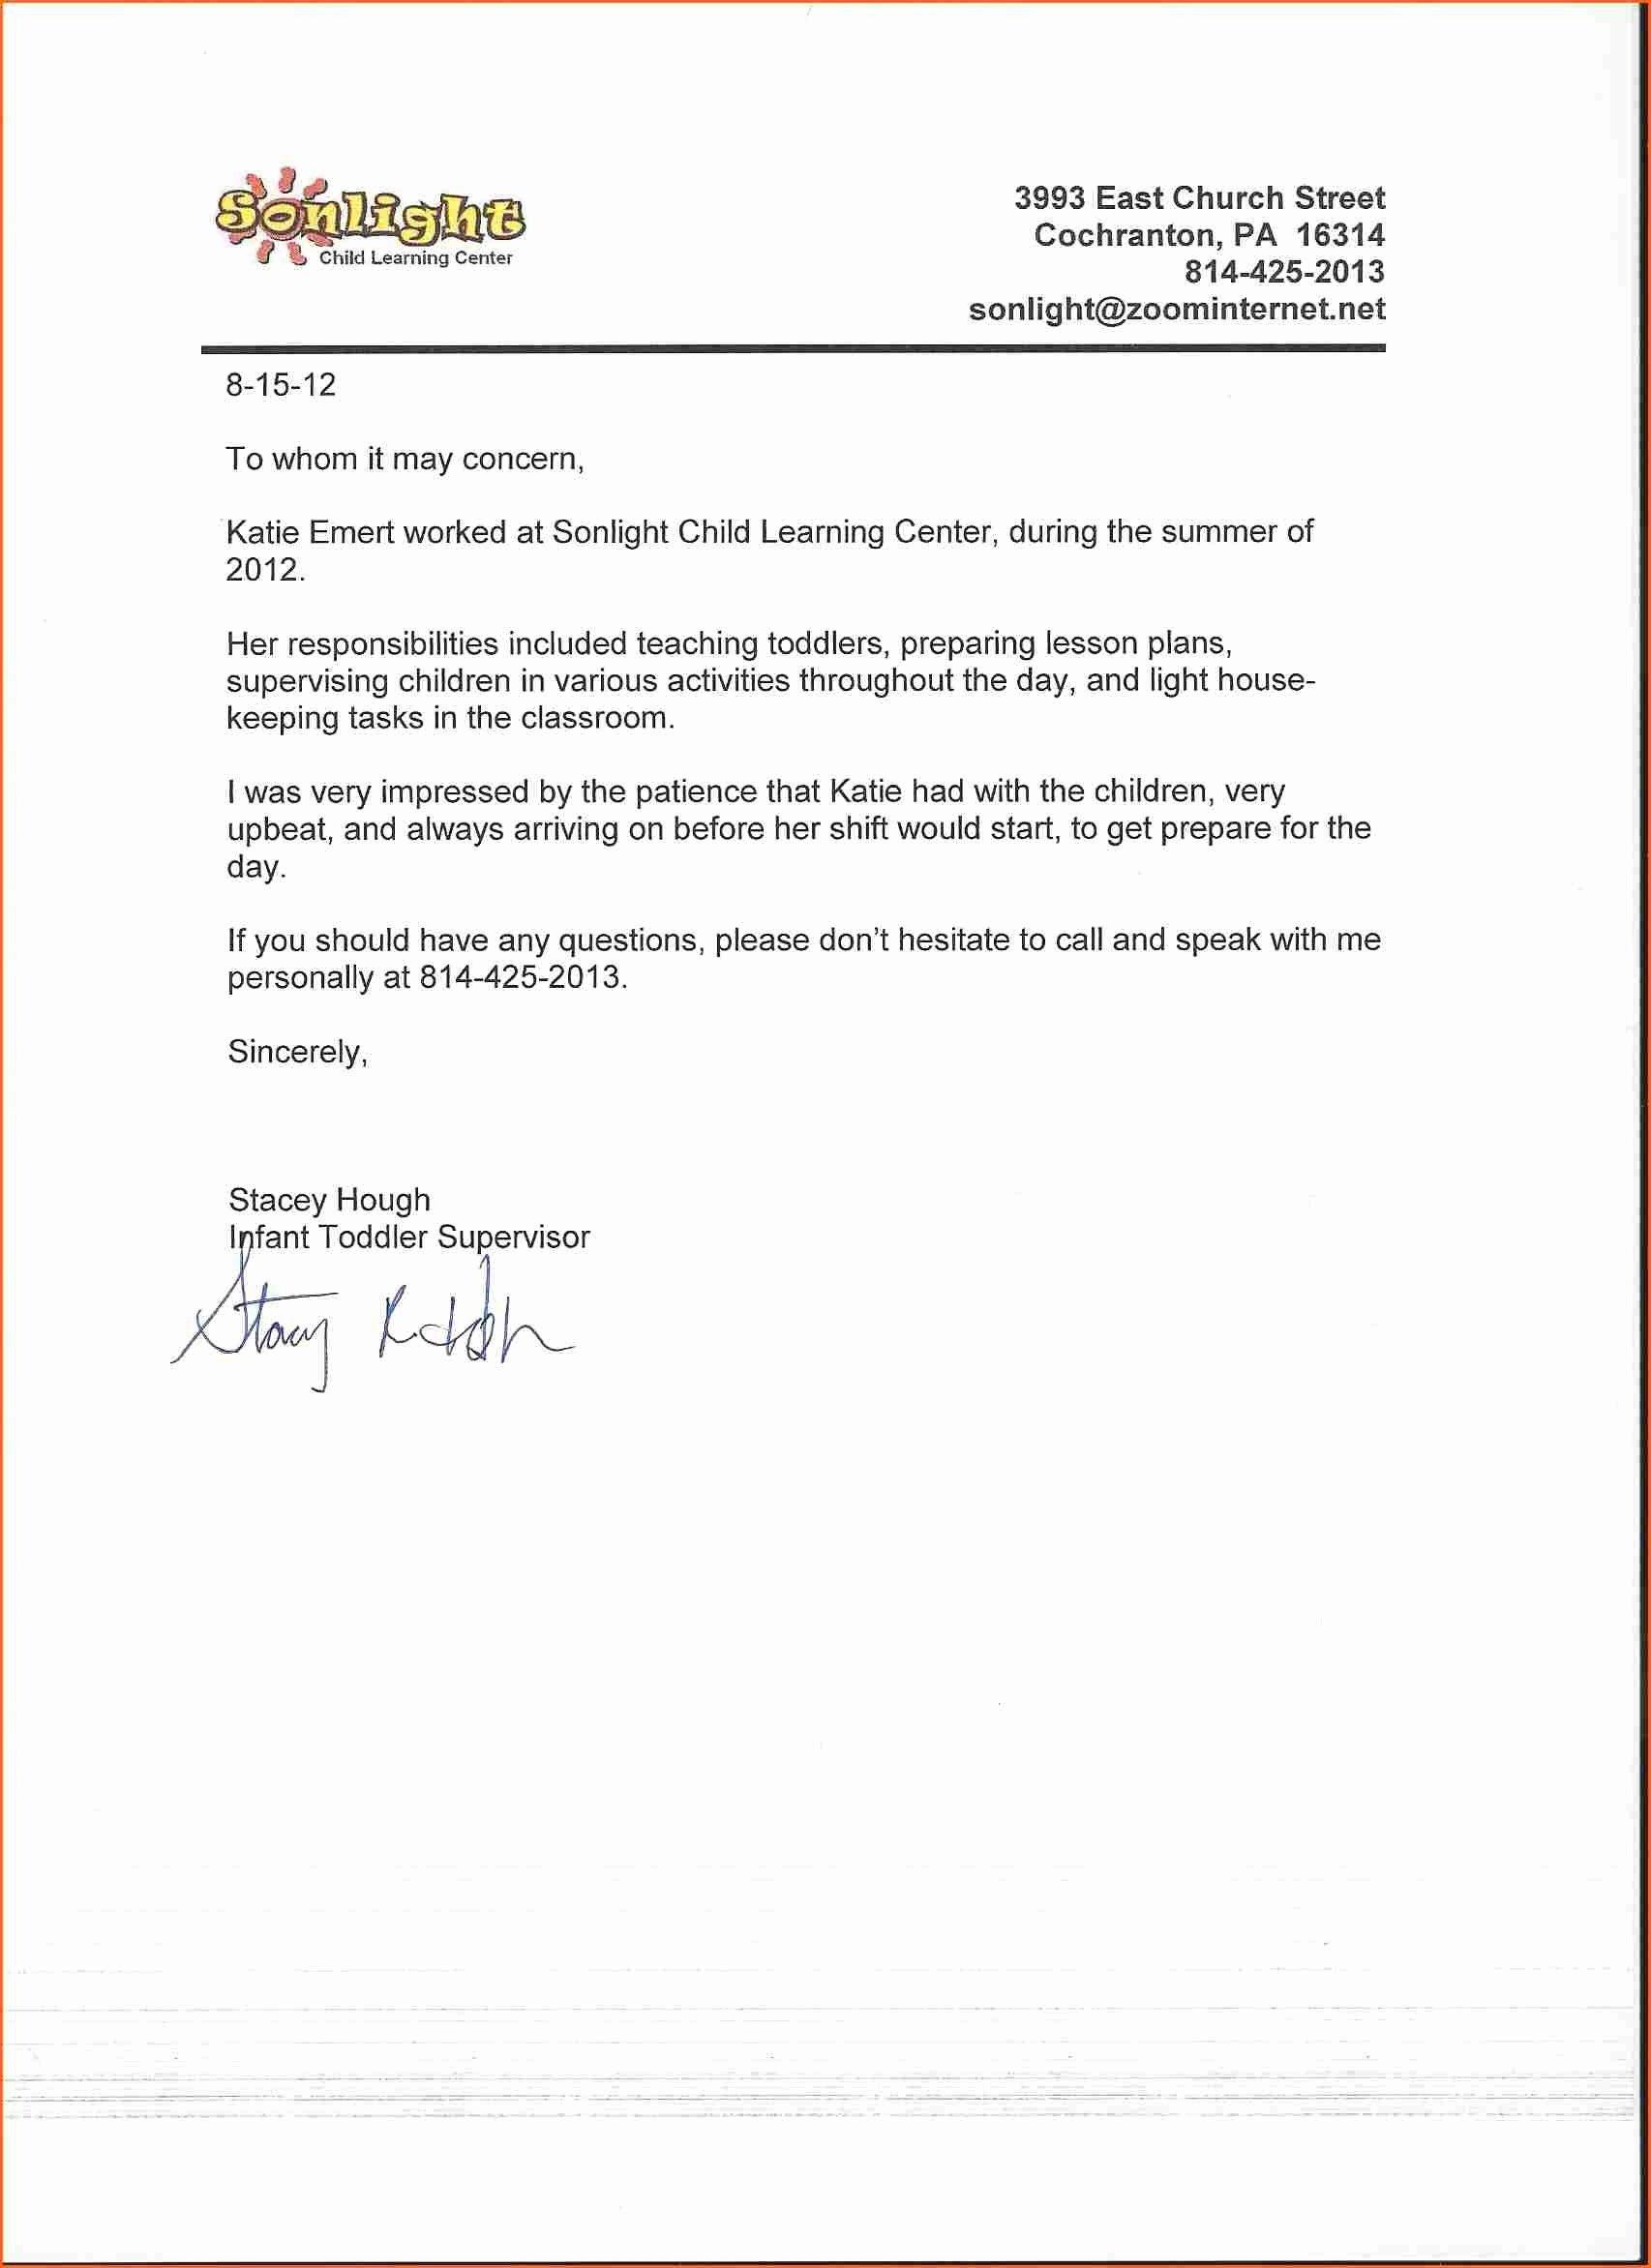 Daycare Letter Of Recommendation Fresh 12 13 Teacher Letter Of Rec Endation